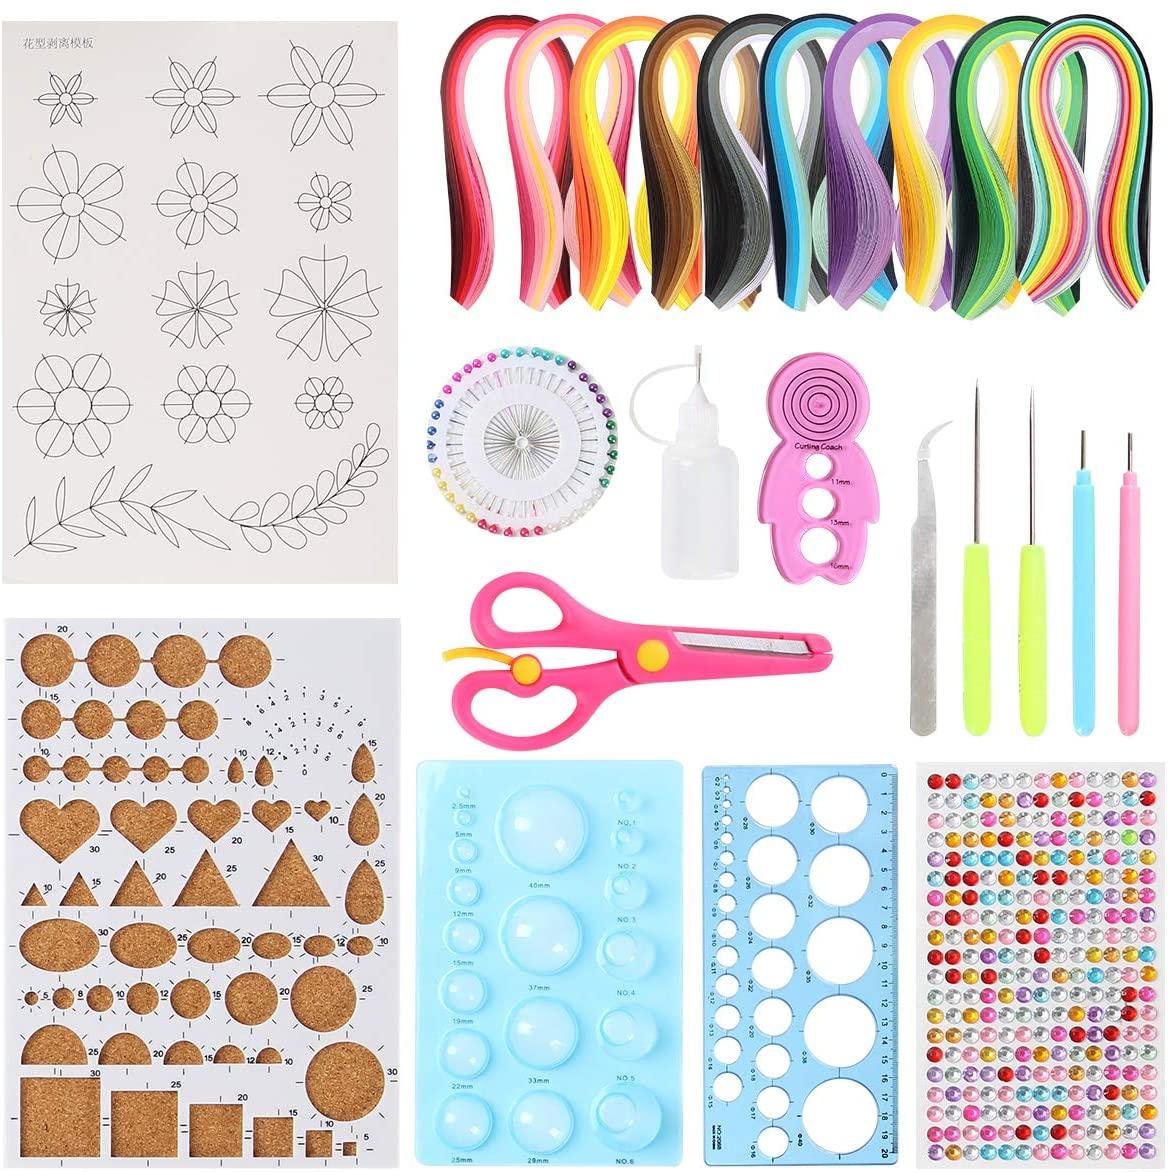 Paper Quilling Tools Set, 15 Pcs Paper Quilling Tools, 1060 Strips Paper Quilling Strips for Paper Quilling DIY Handcrafts, Paper Flower Making, Paper Art Craft, Set of 25 (B)